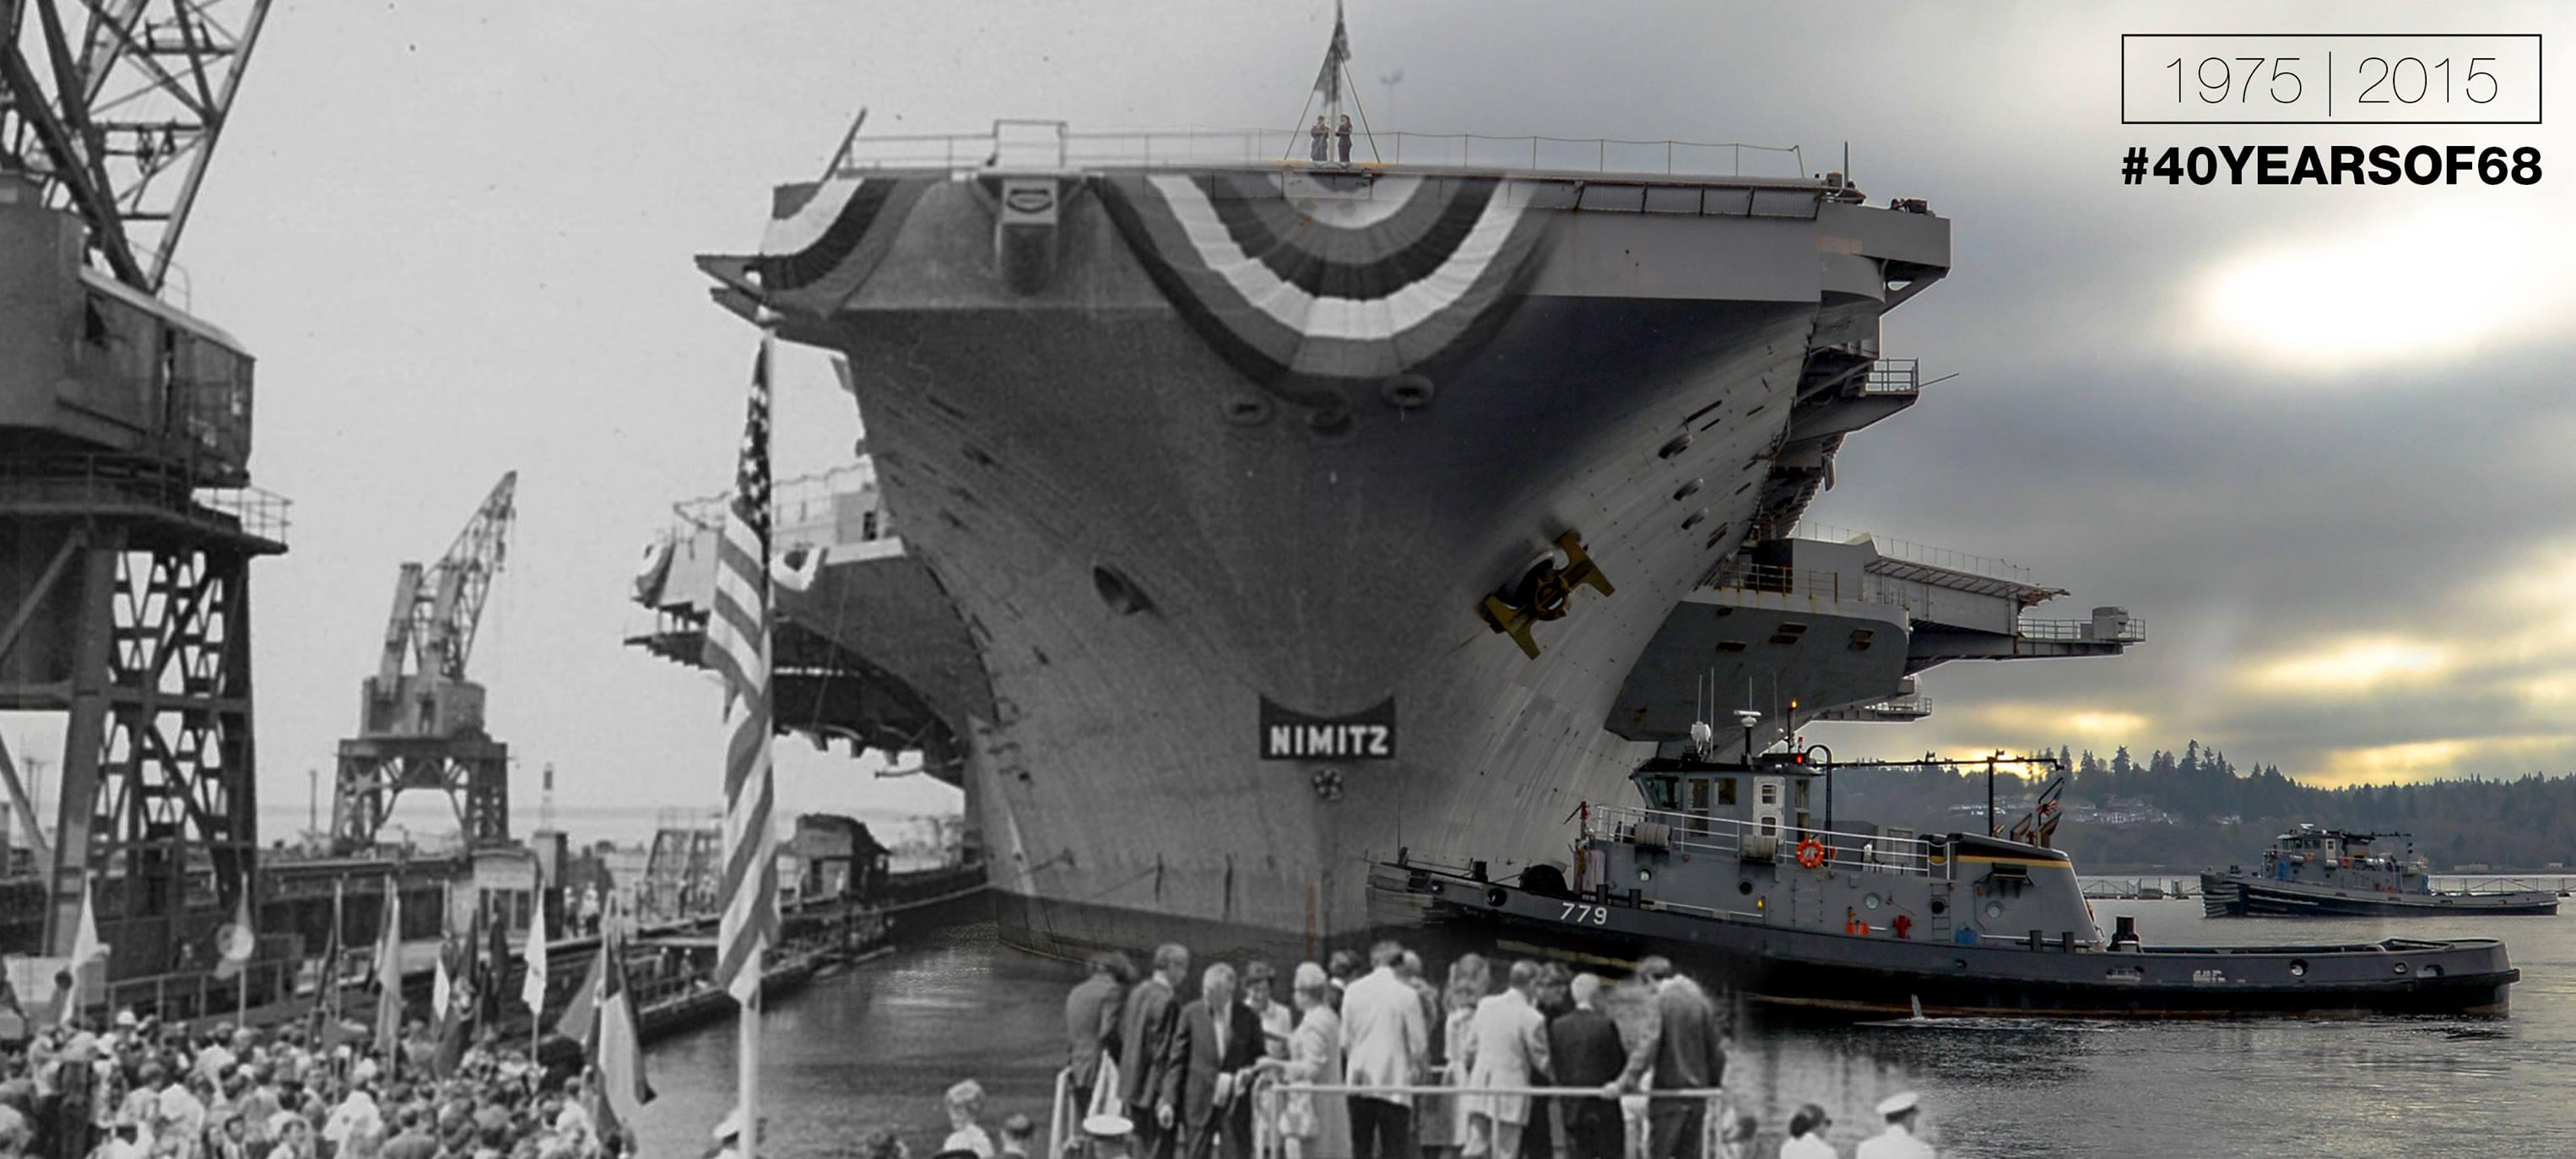 CVN-68 Nimitz